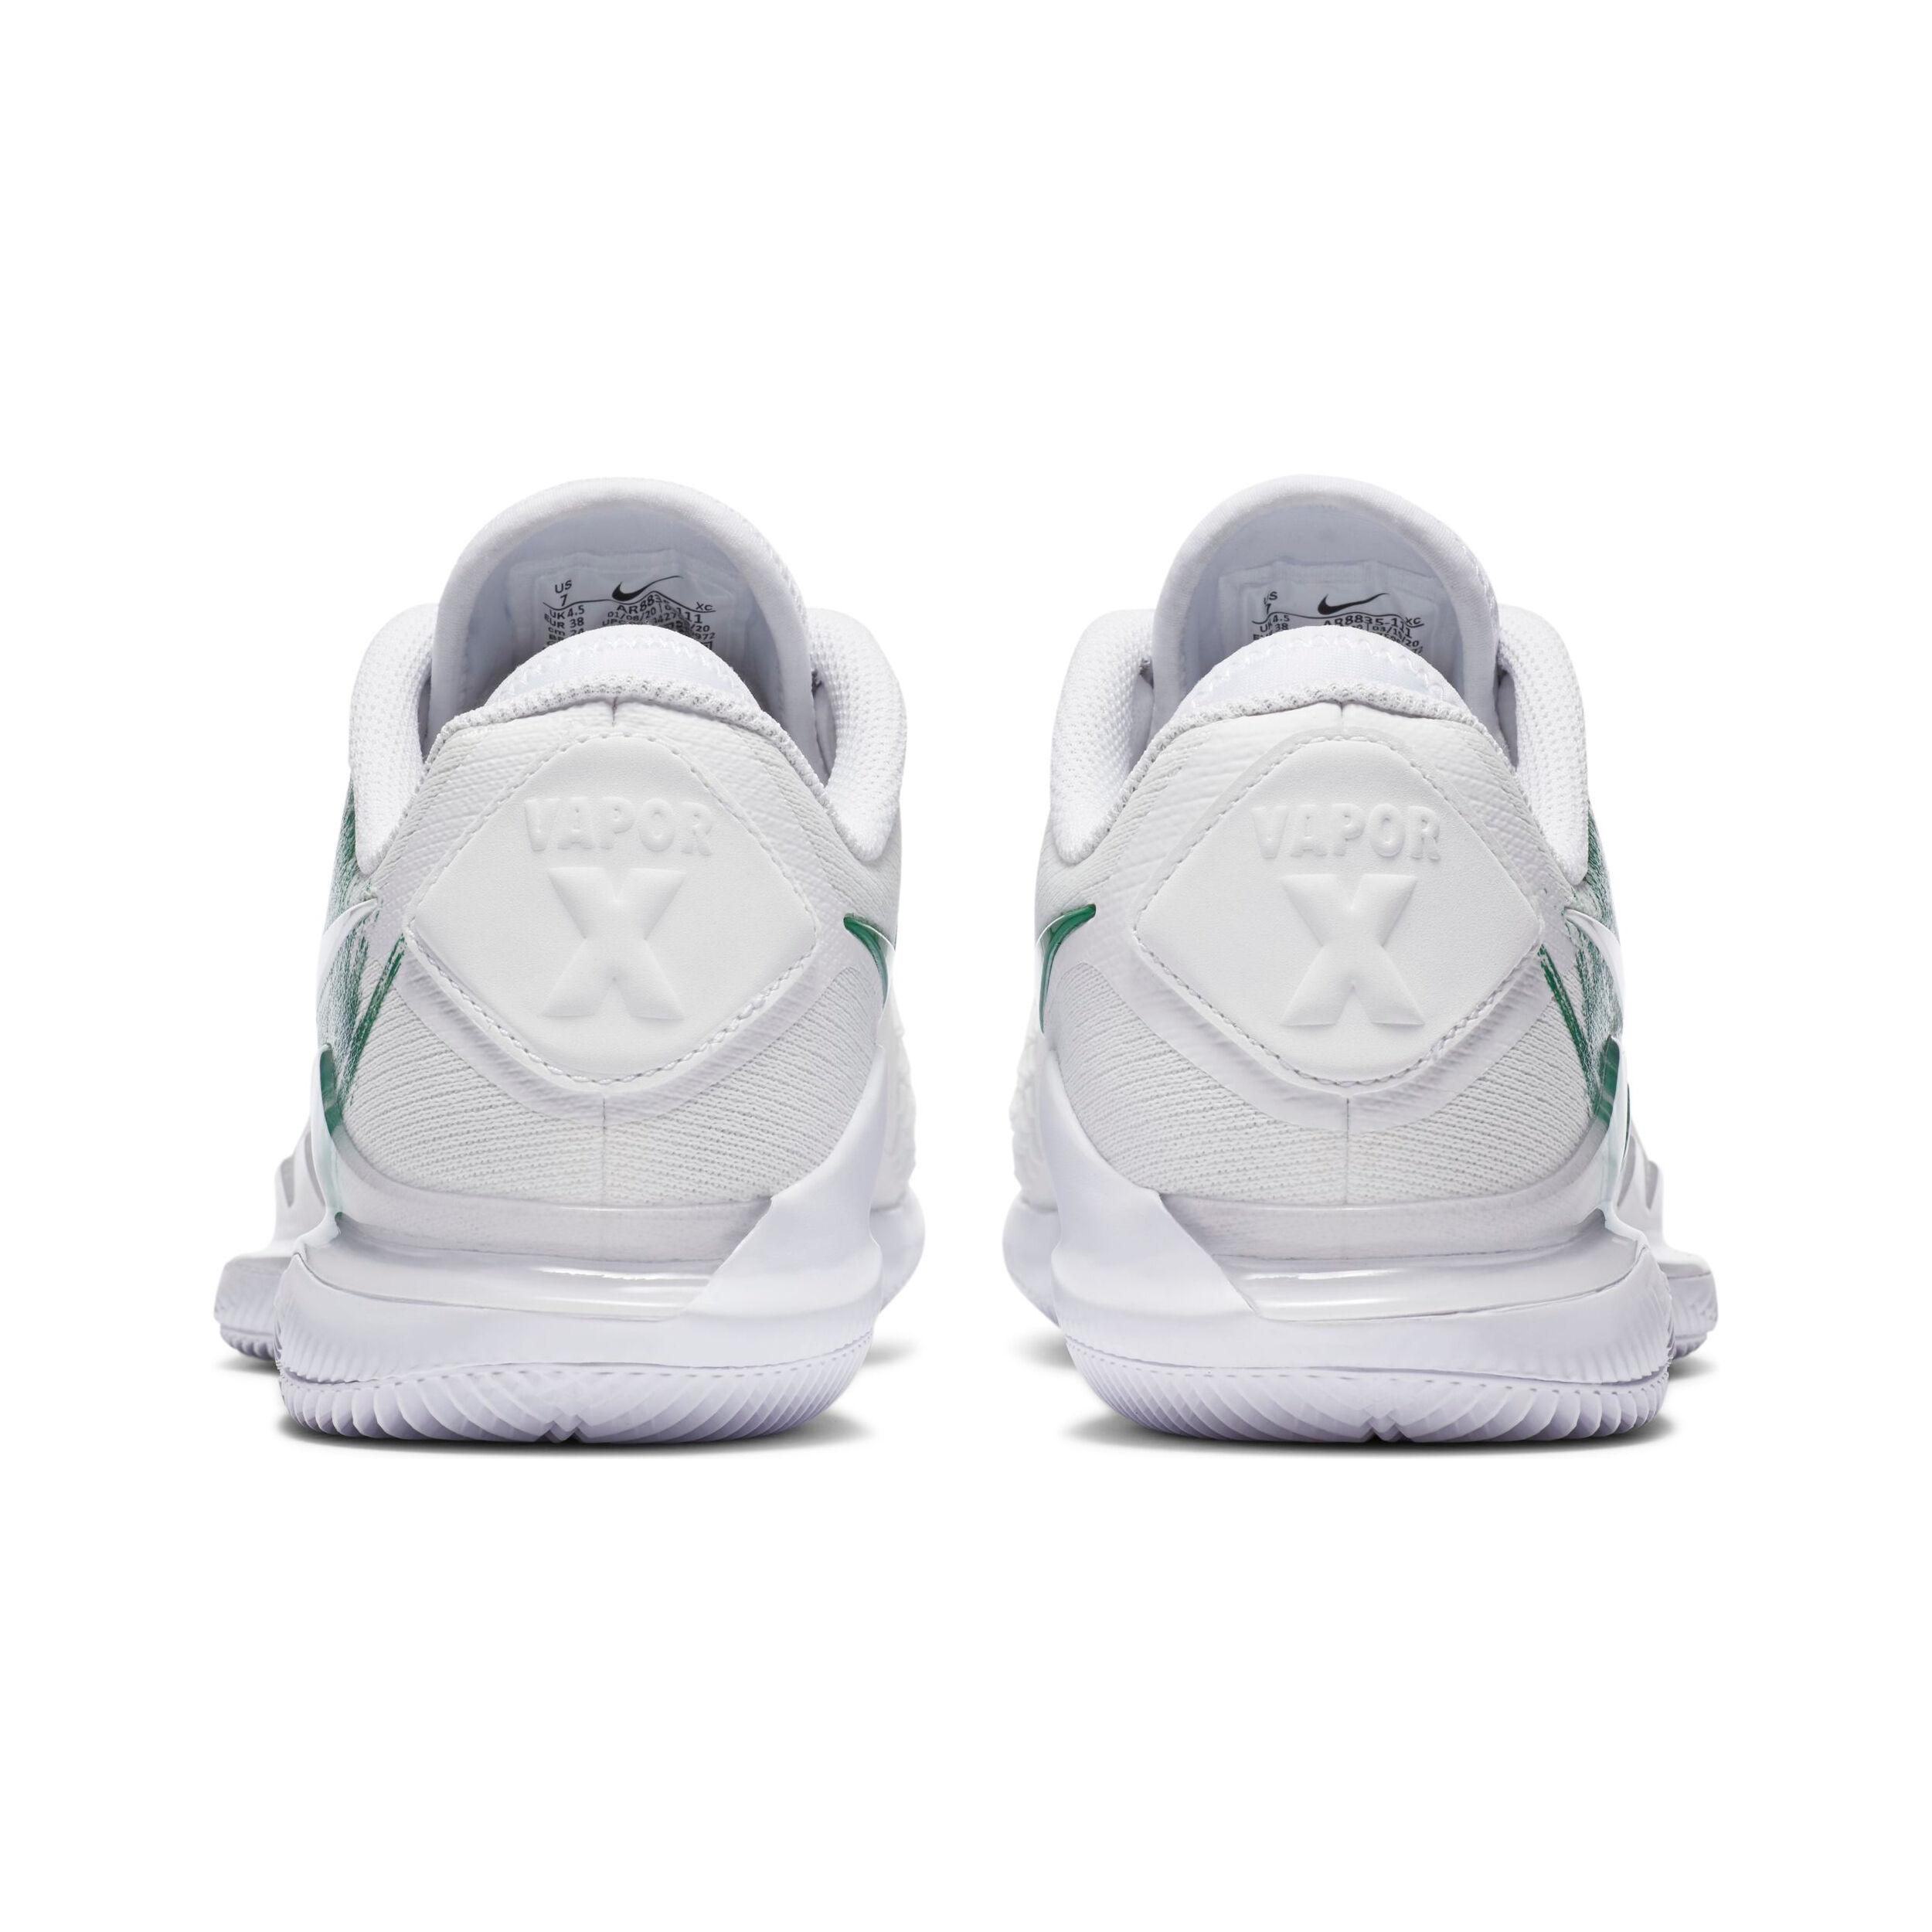 Nike Air Zoom Vapor X Knit Chaussures Toutes Surfaces Femmes